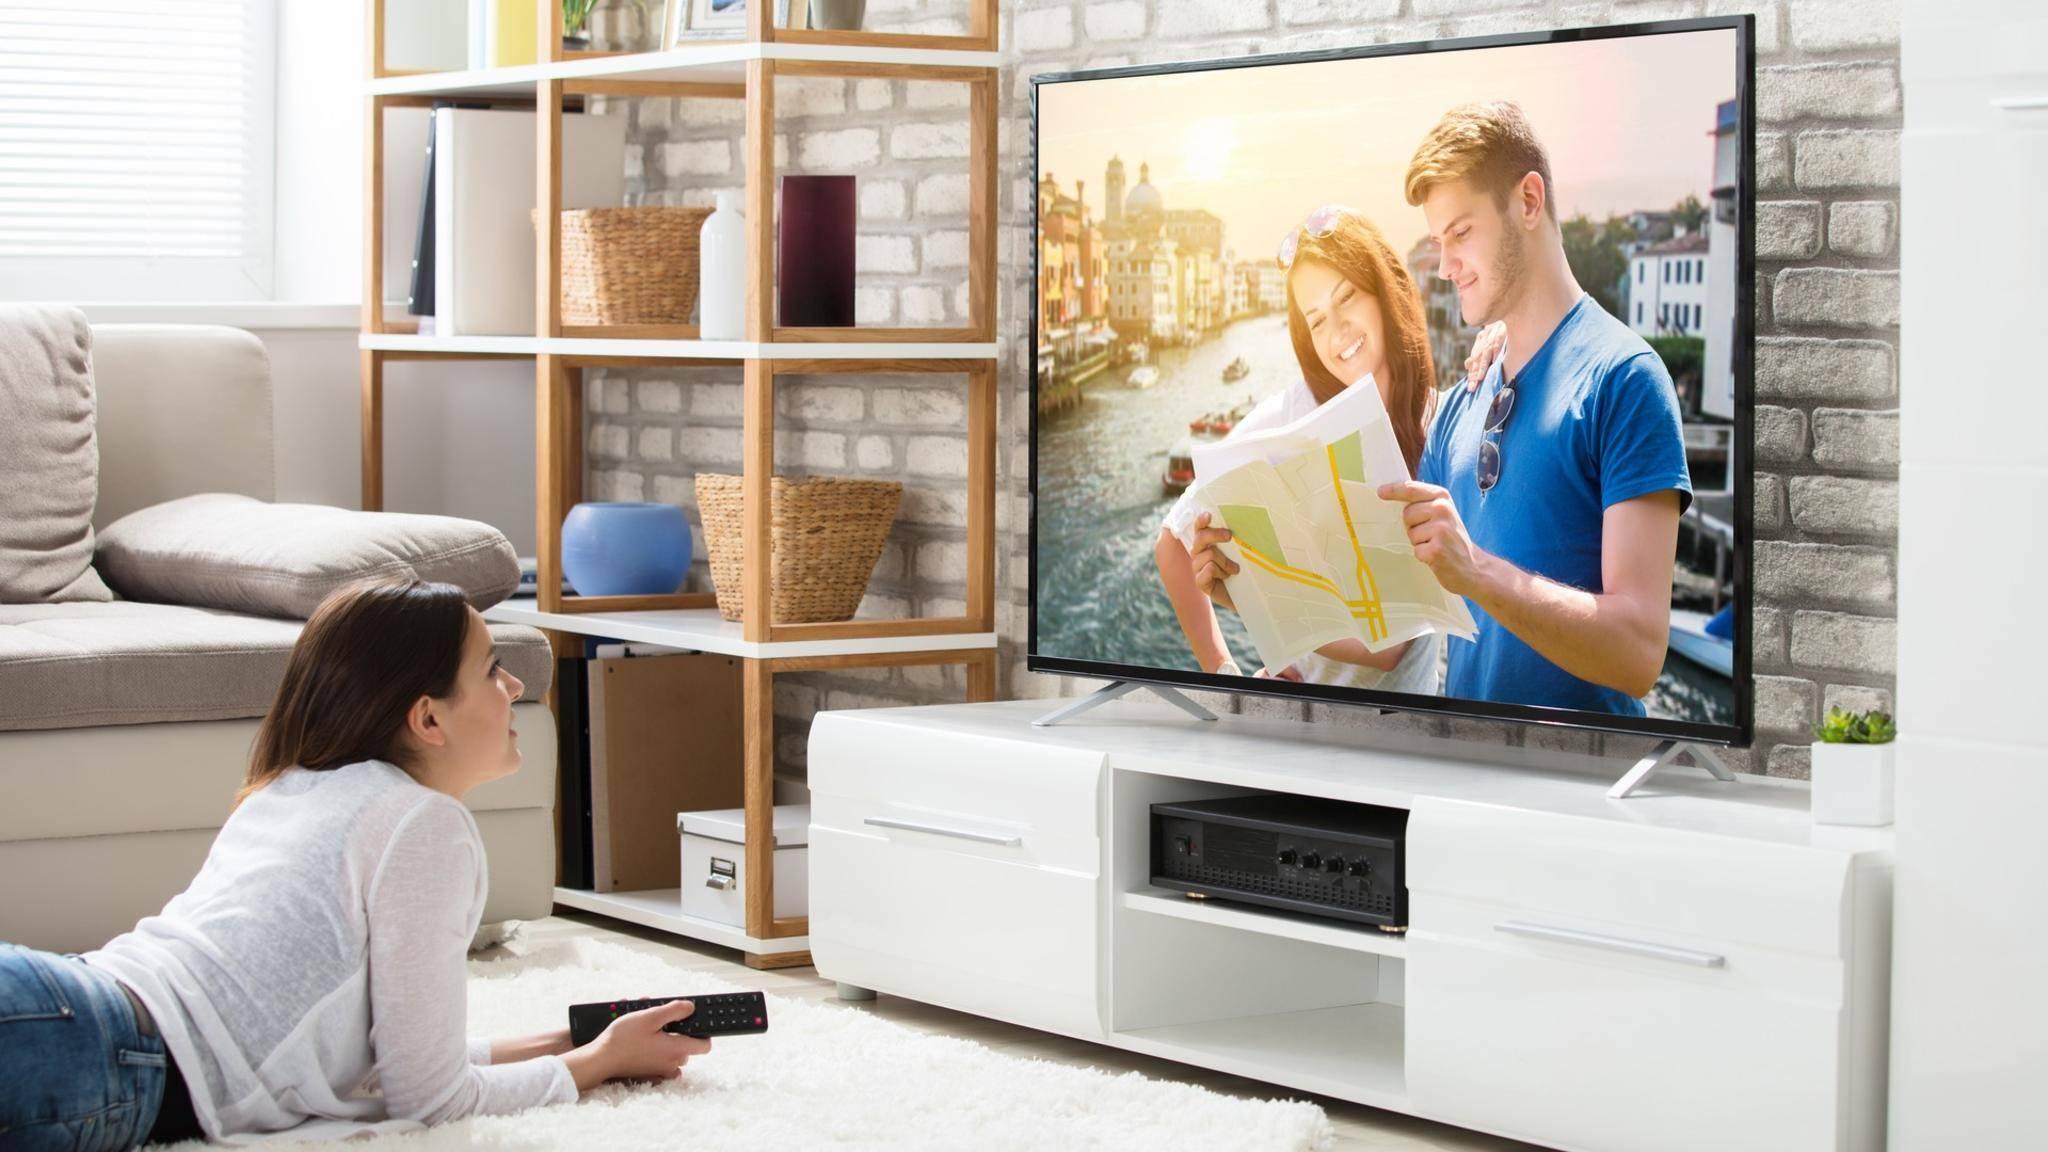 Frau, fernsehen, liegen, liegend, TV